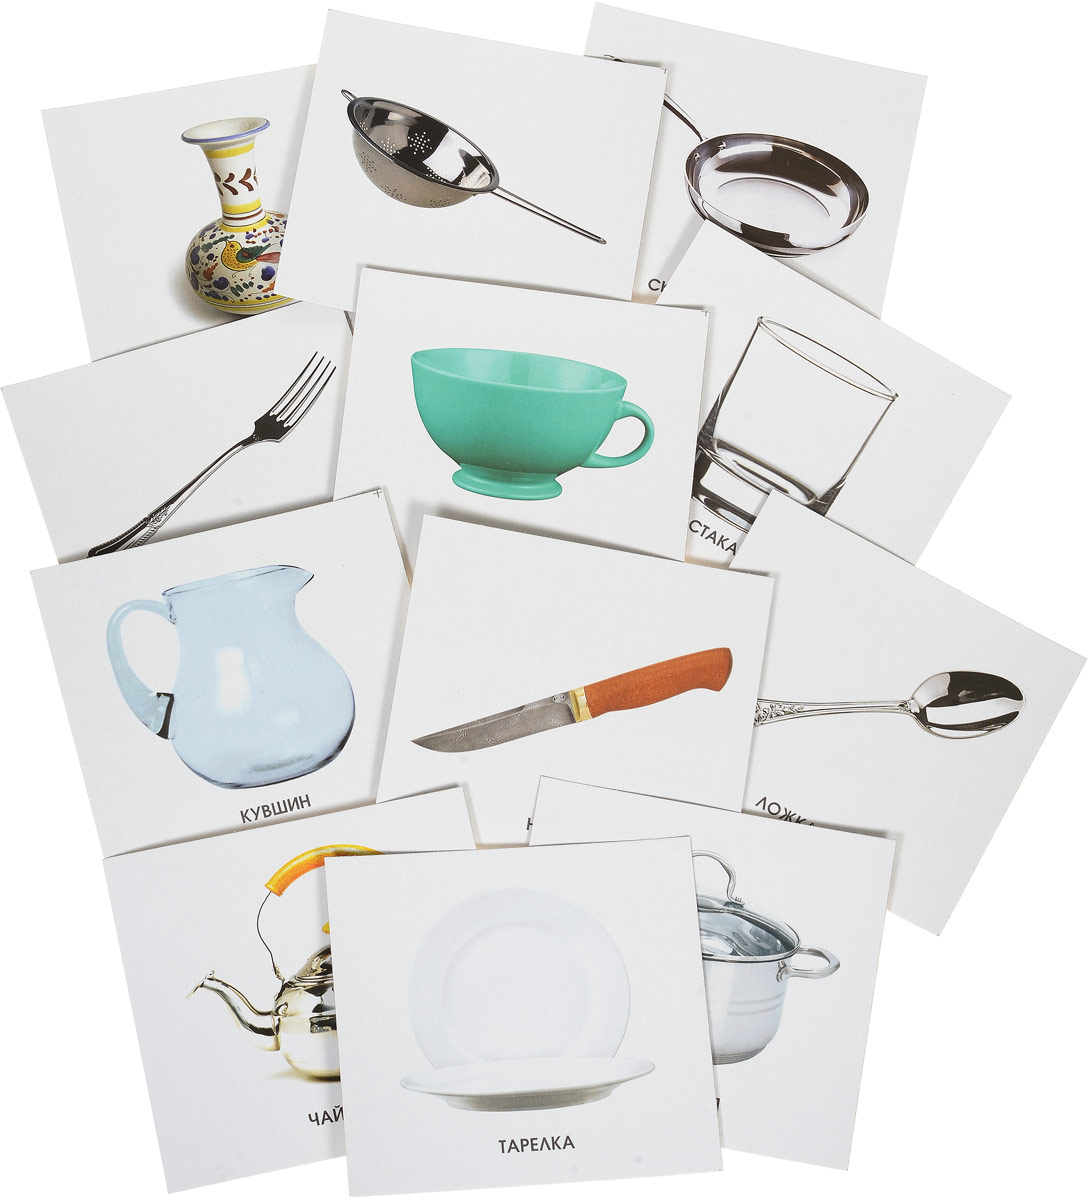 Улыбка Обучающие карточки Посуда улыбка обучающие карточки игрушки